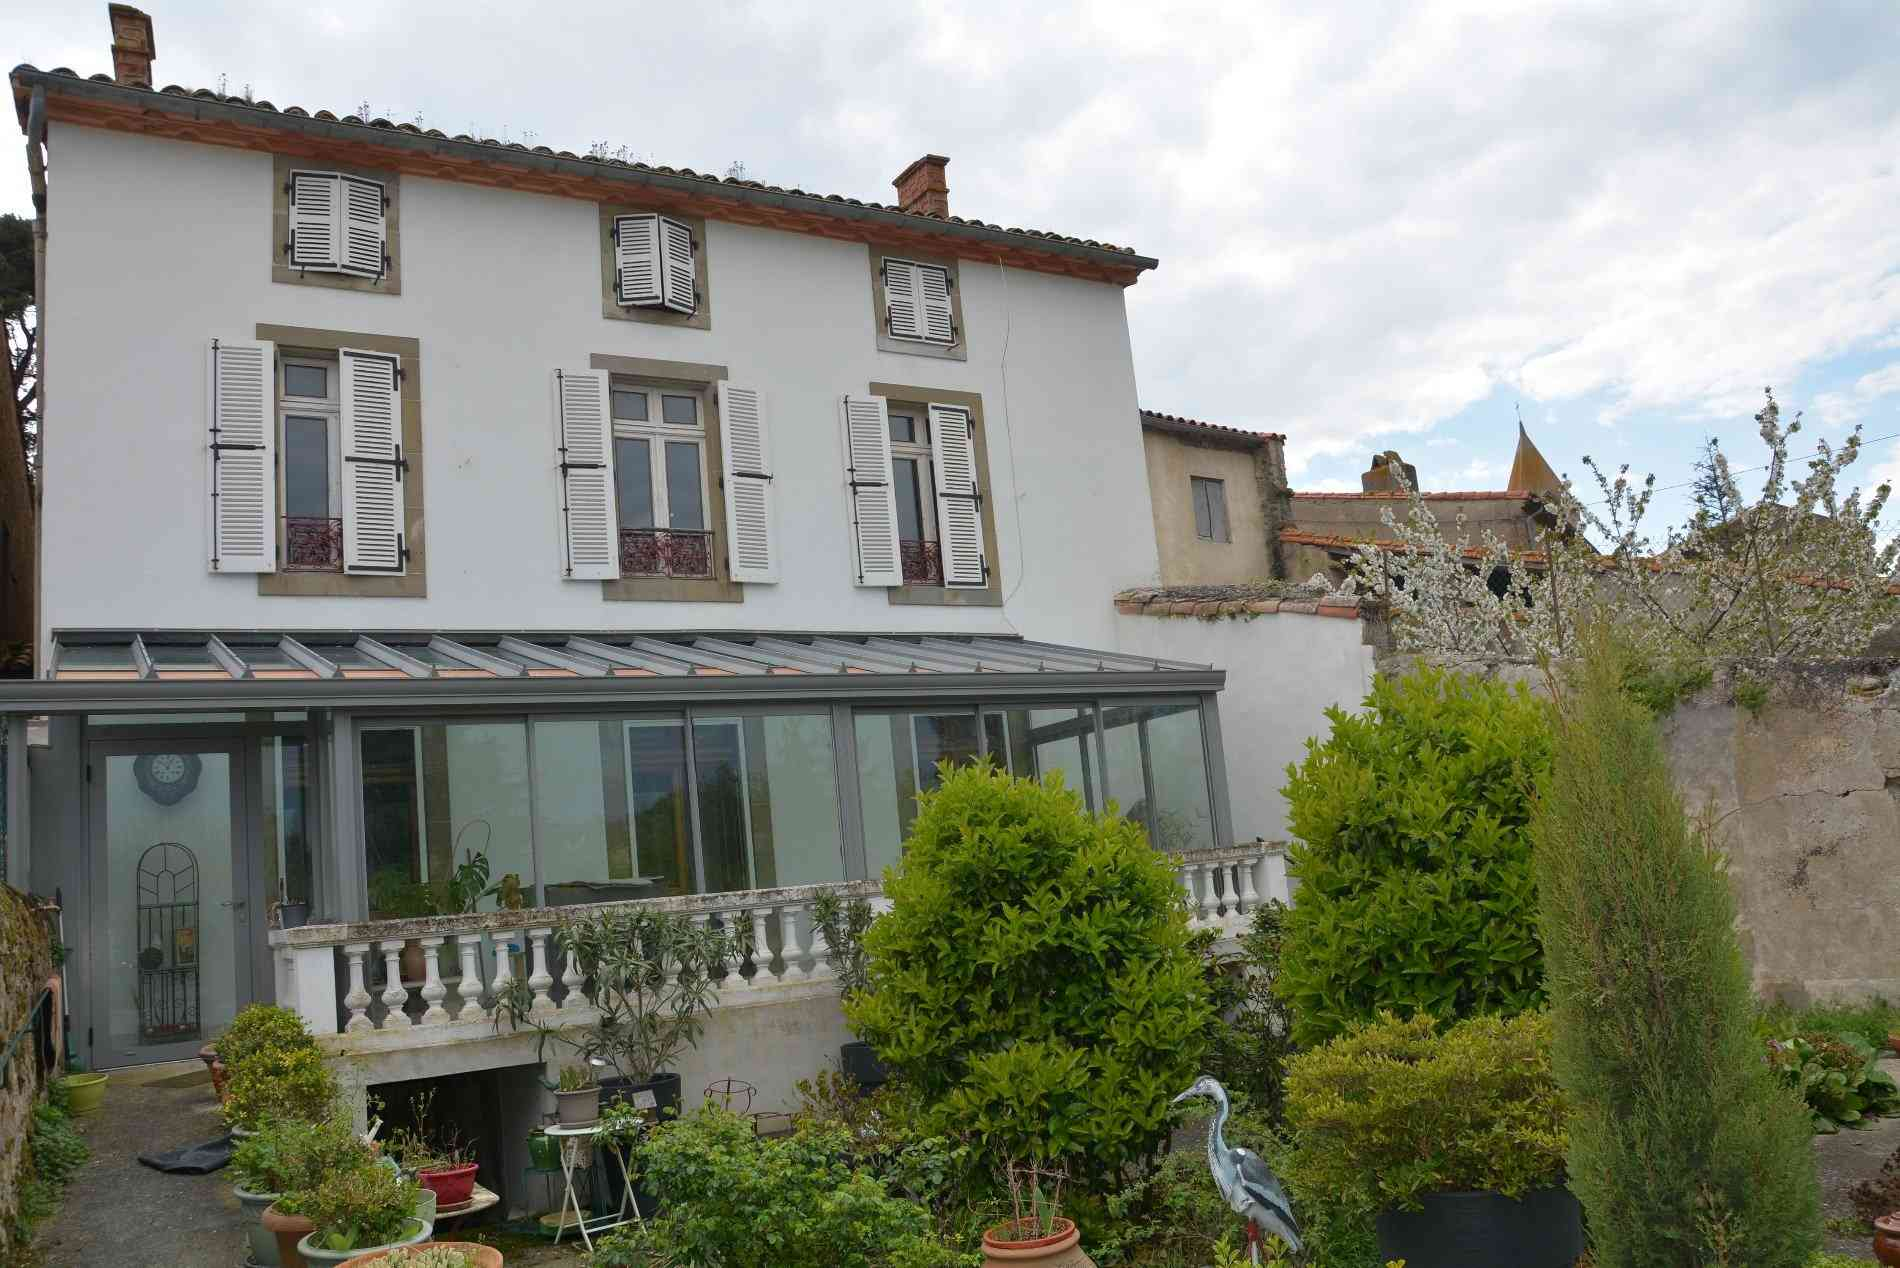 Maison CARCASSONNAIS | 214 000 €